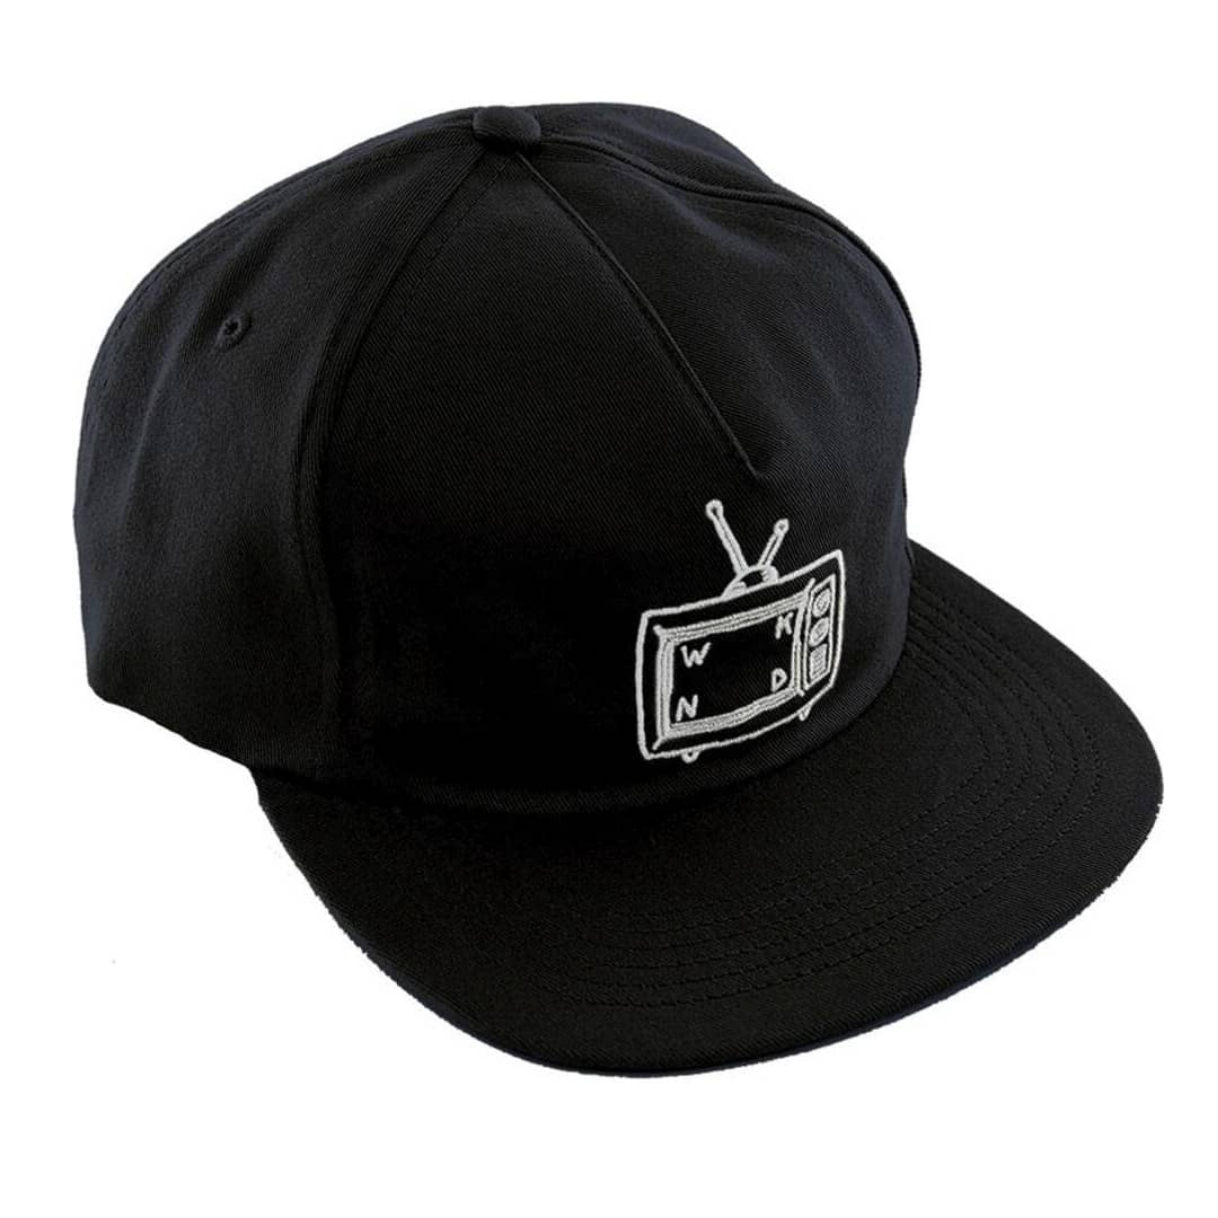 WKND TV Logo Black Cap